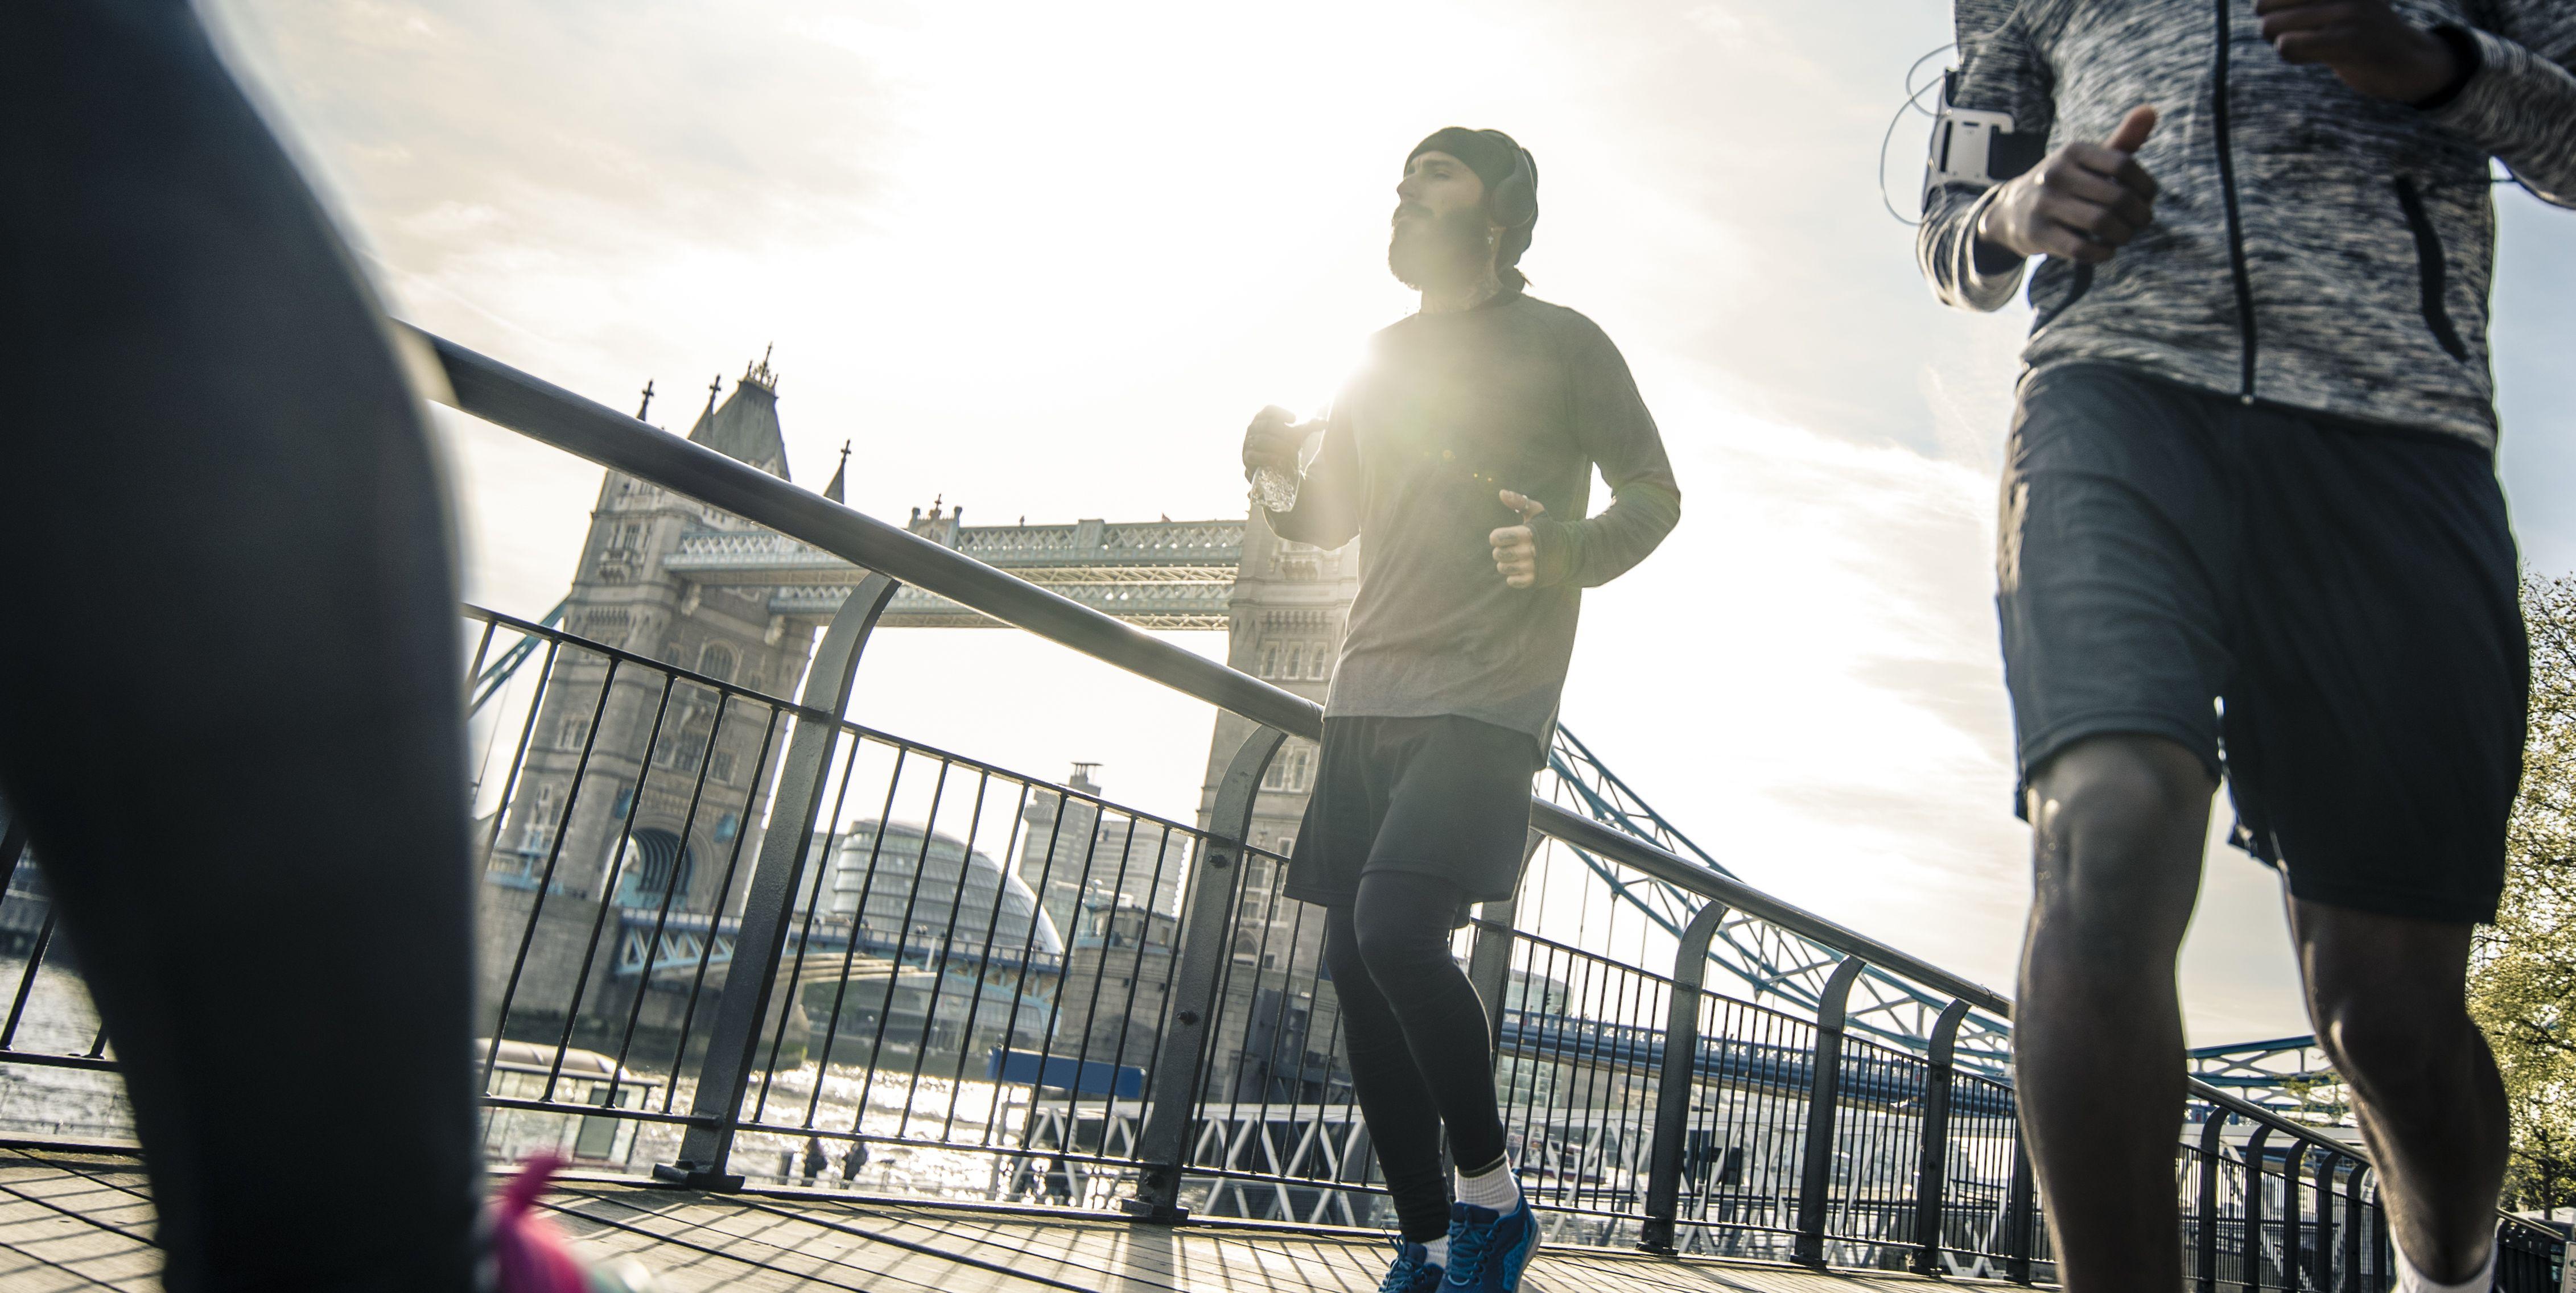 Morning run in London